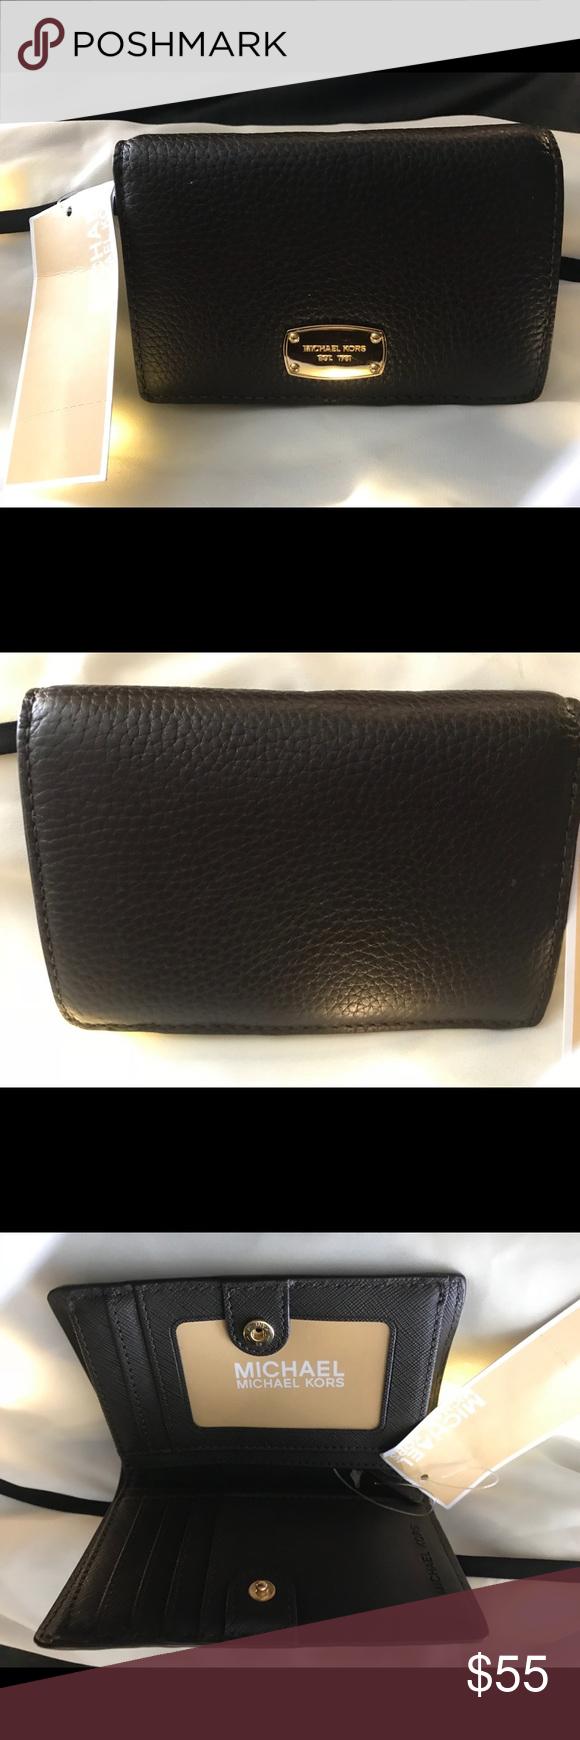 Wallet jet set Slim wallet 100% leather Michael Kors Bags Wallets